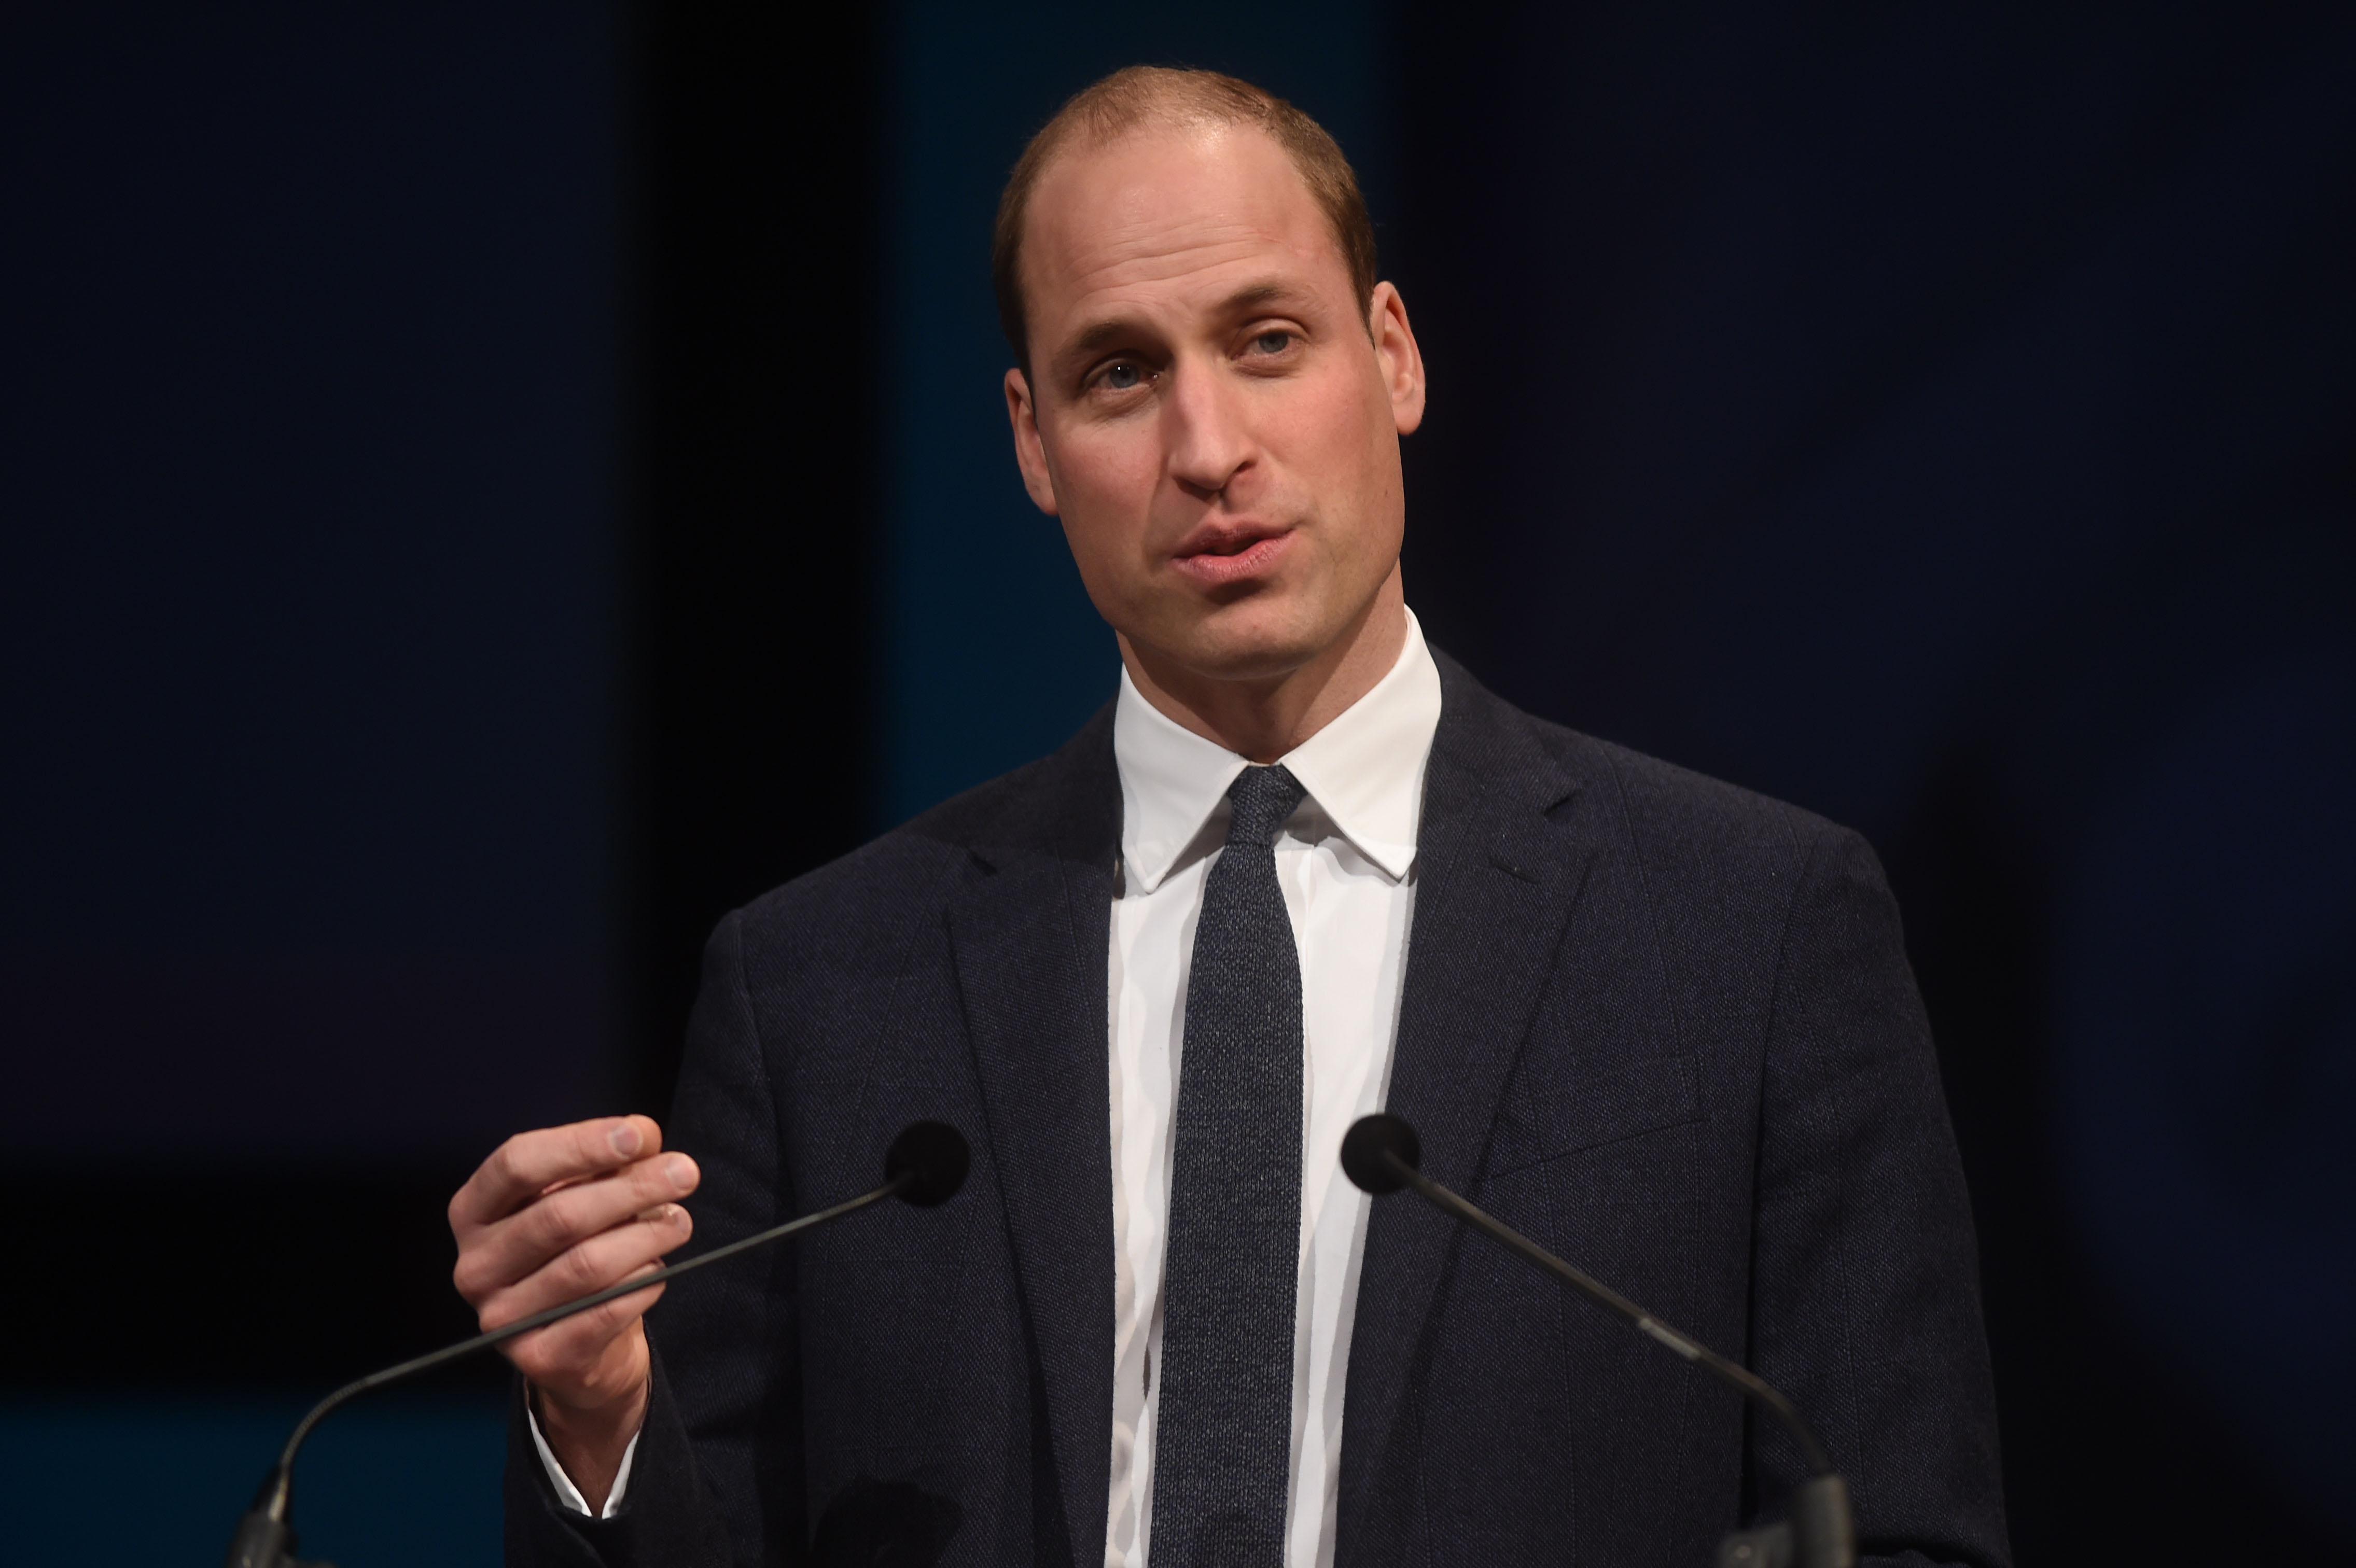 Le crâne rasé, sa meilleure parade face à la calvitie — Prince William